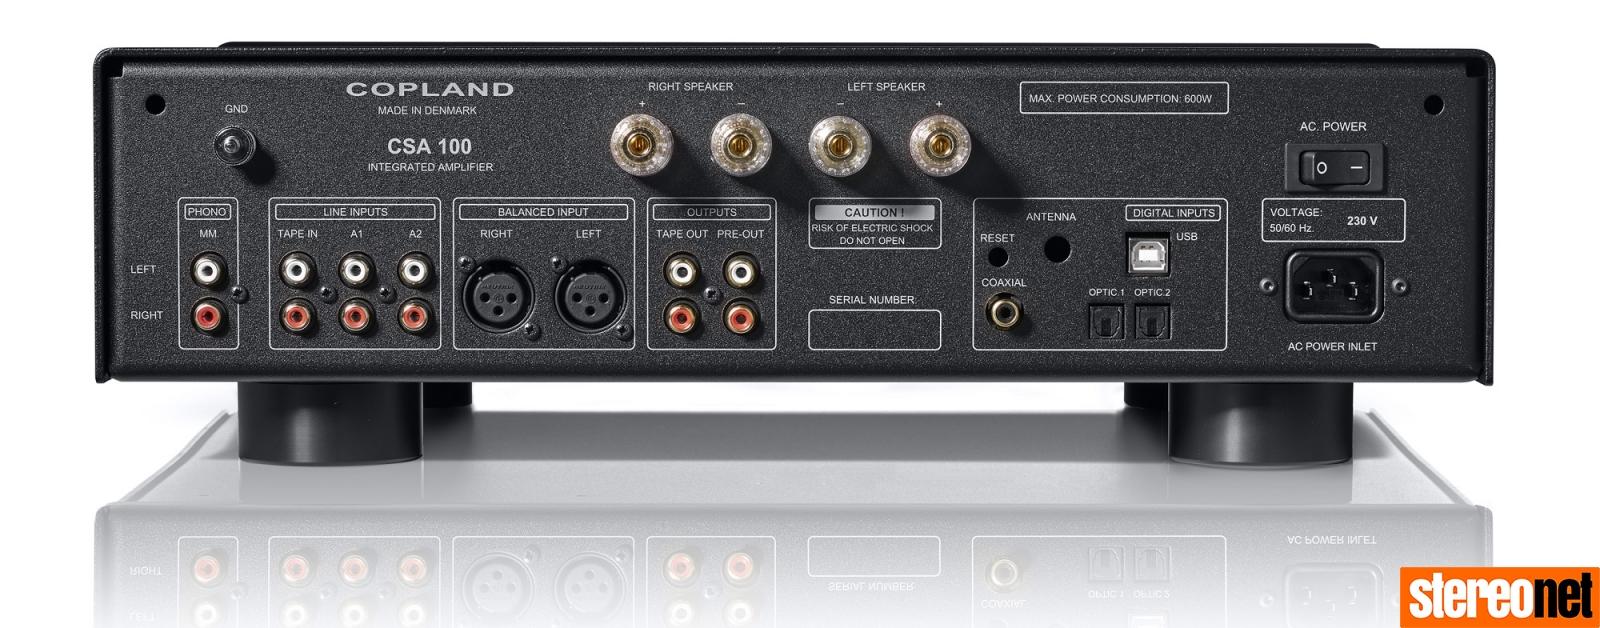 Copland CSA100 integrated amplifier